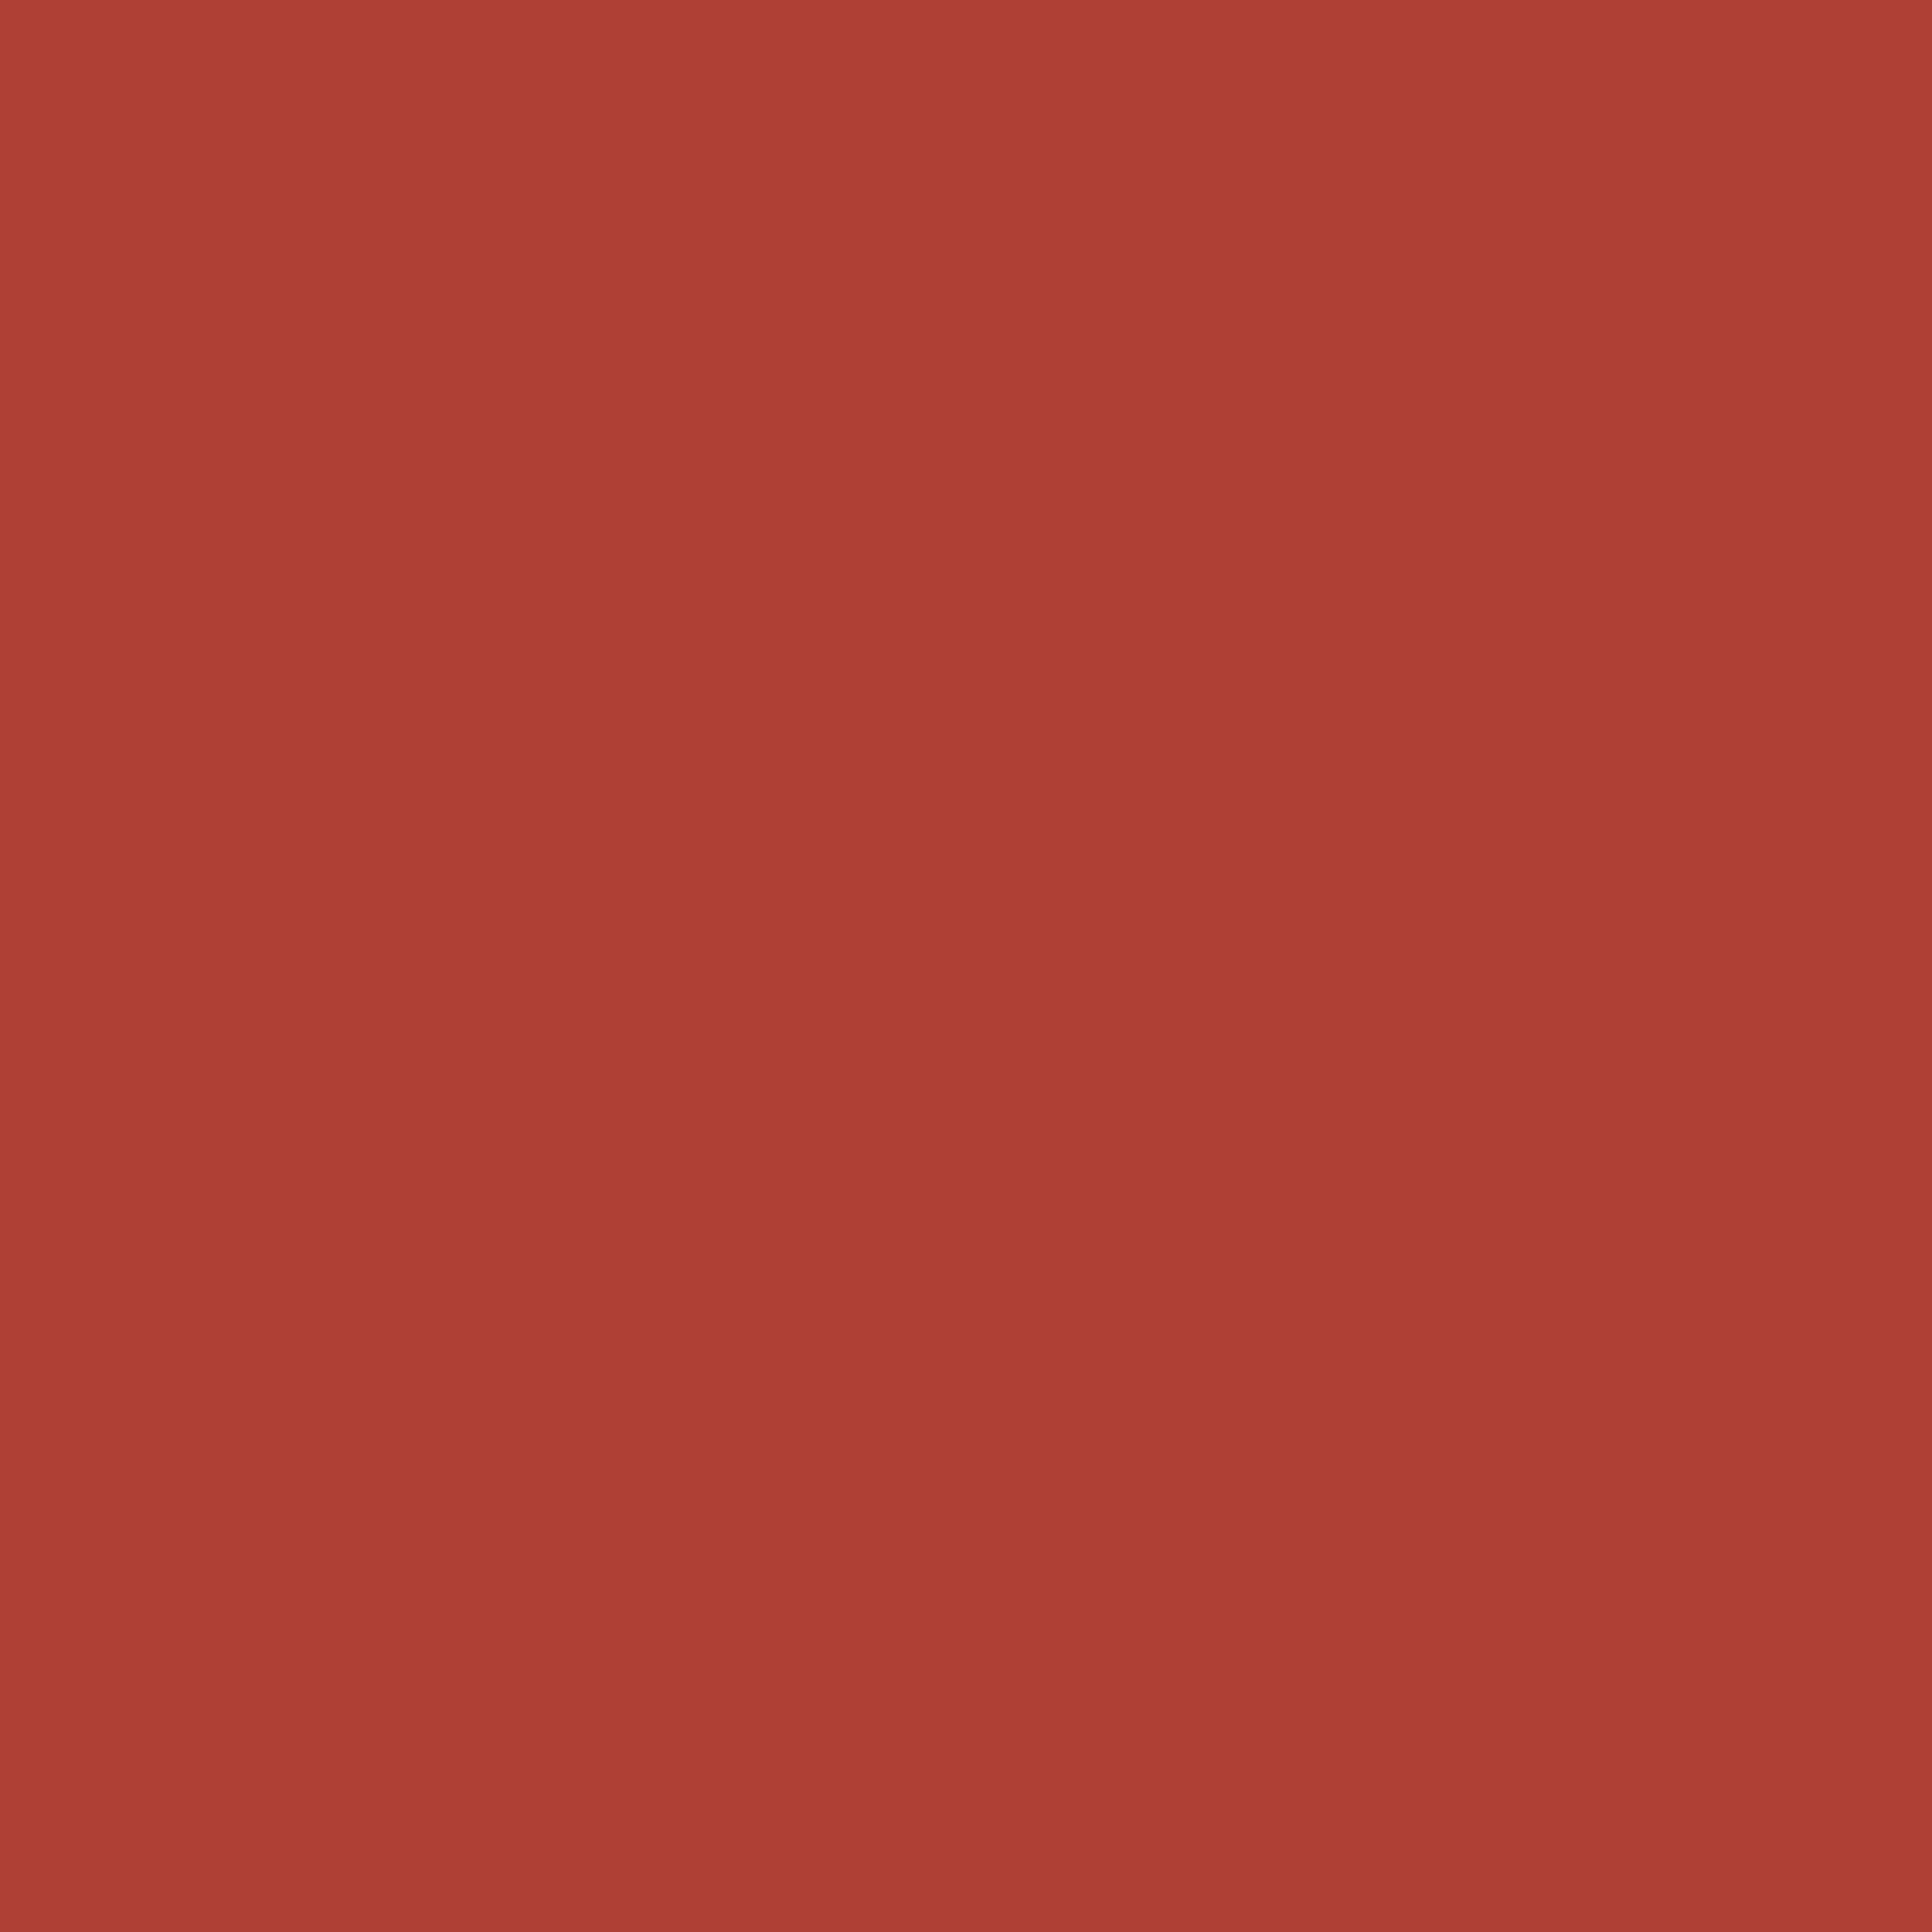 3600x3600 Medium Carmine Solid Color Background